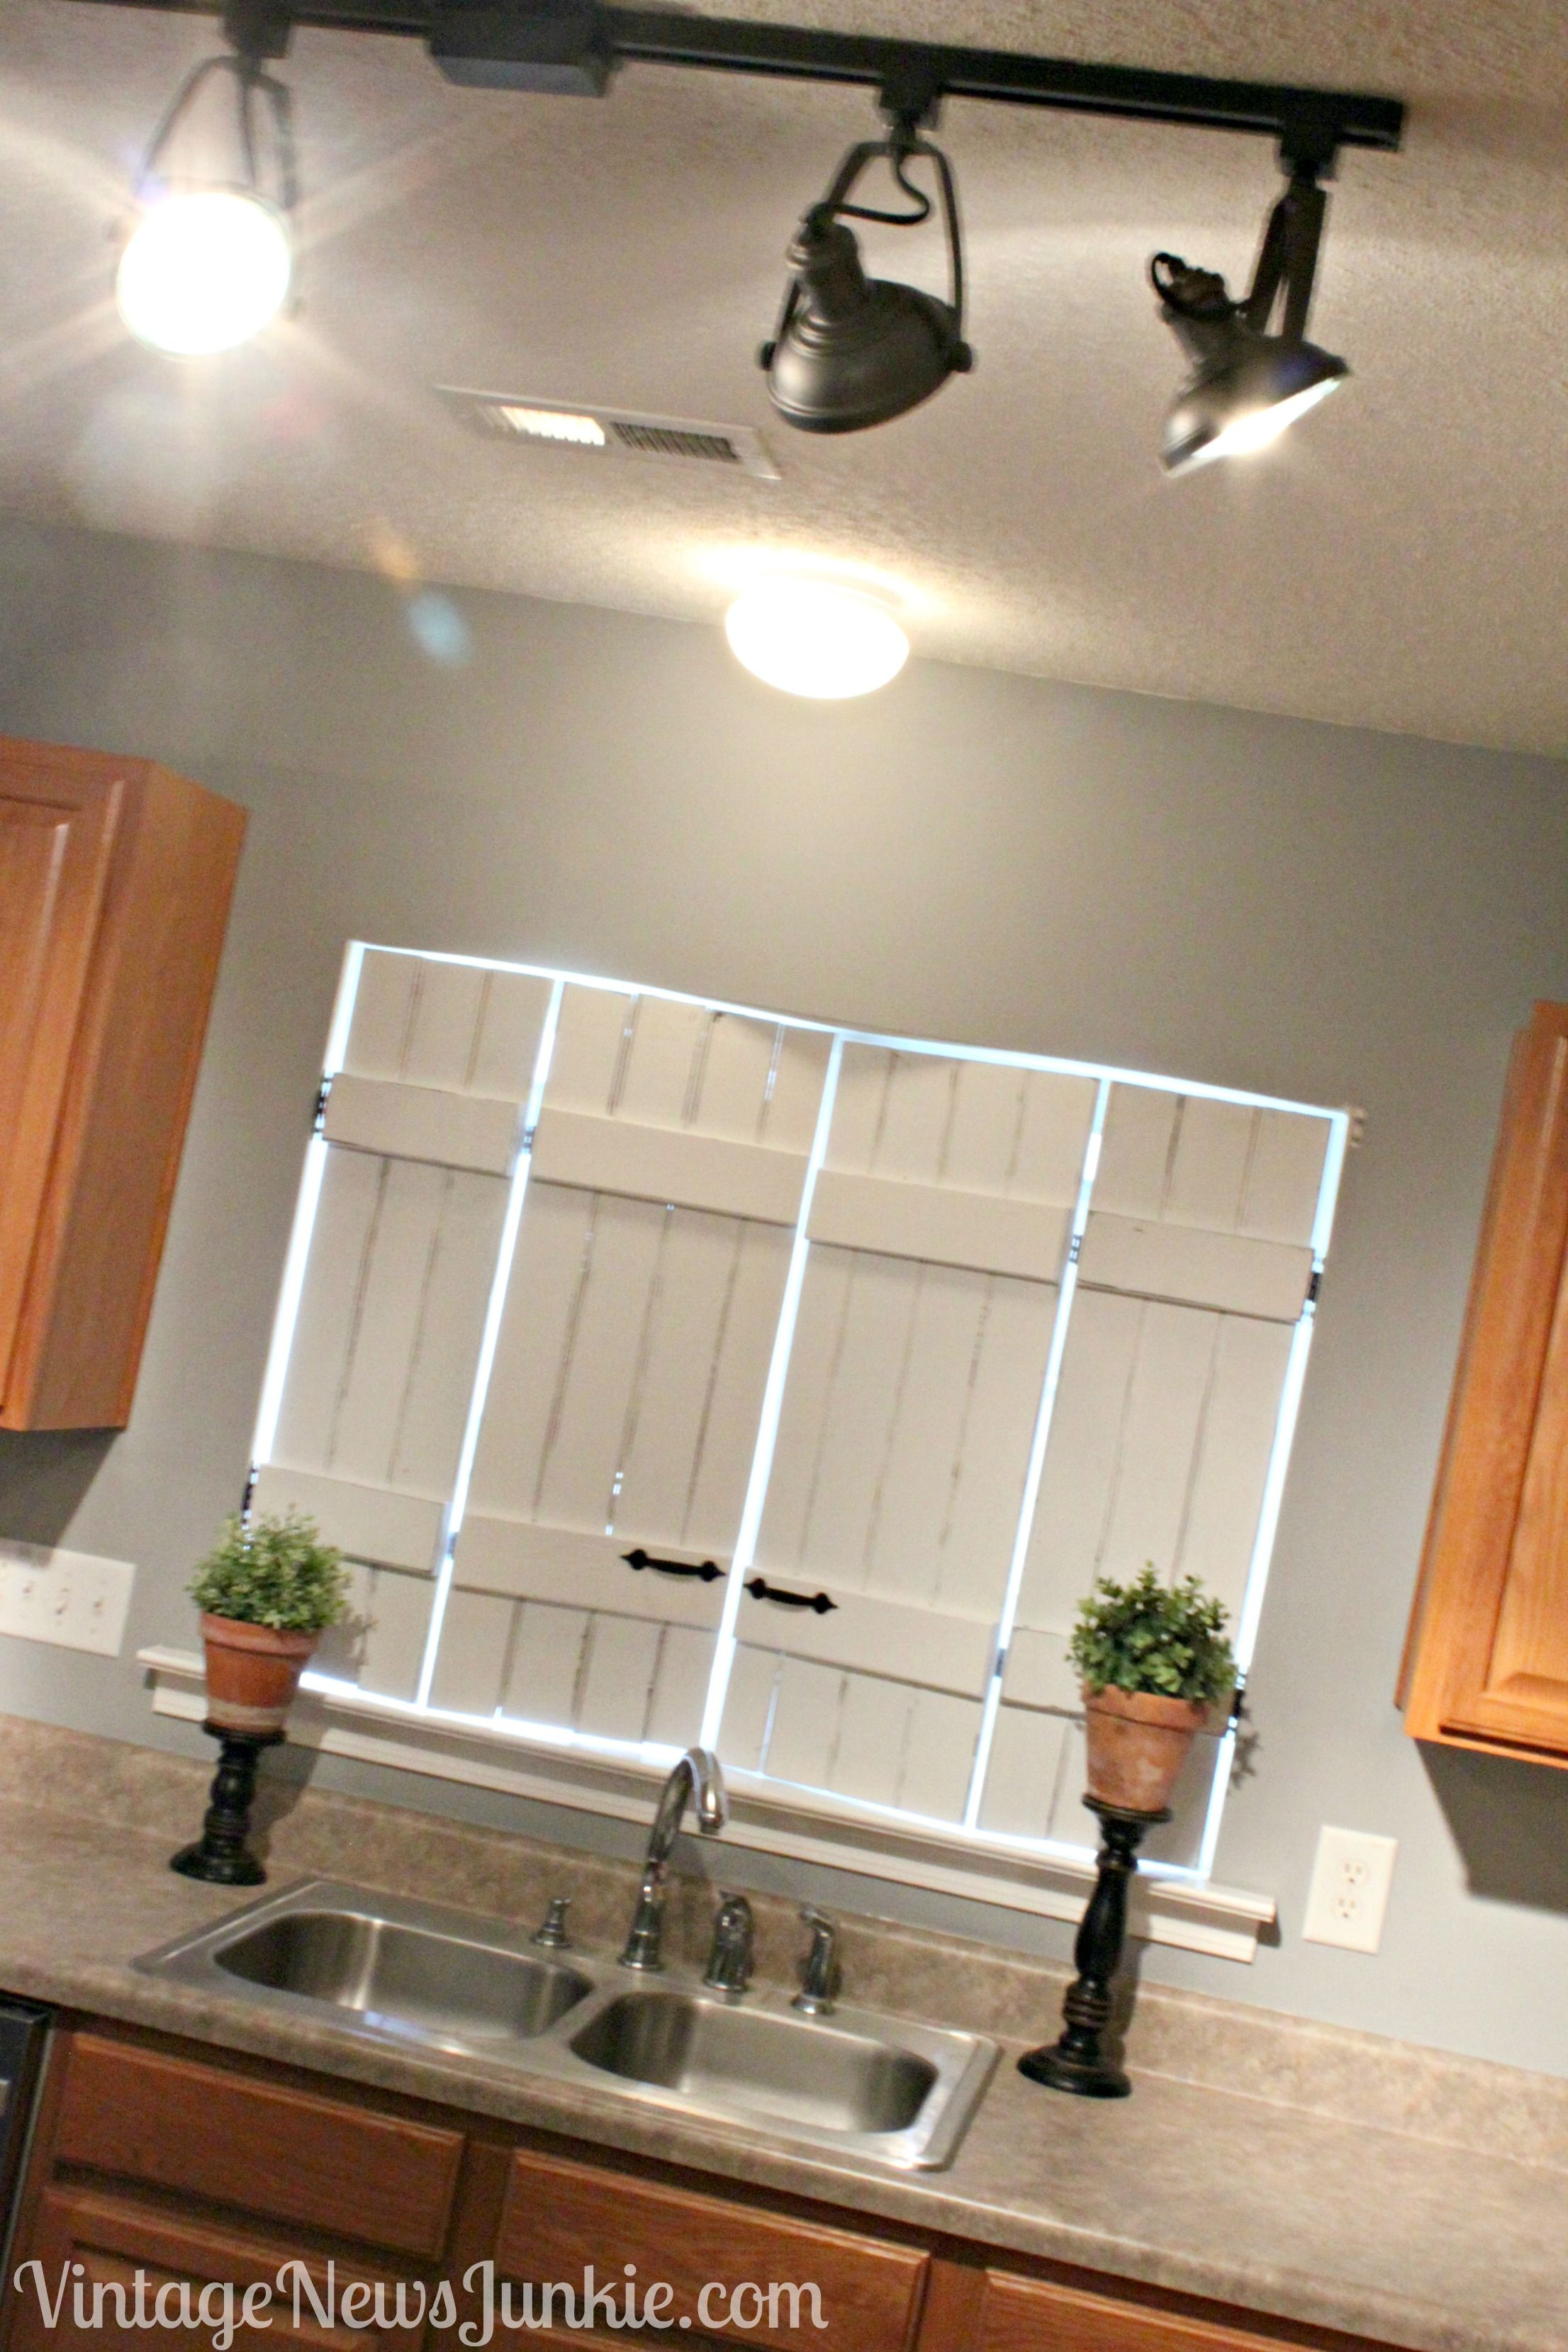 Ikea Bed Slats Turned Indoor Shutters Kitchen Shutters